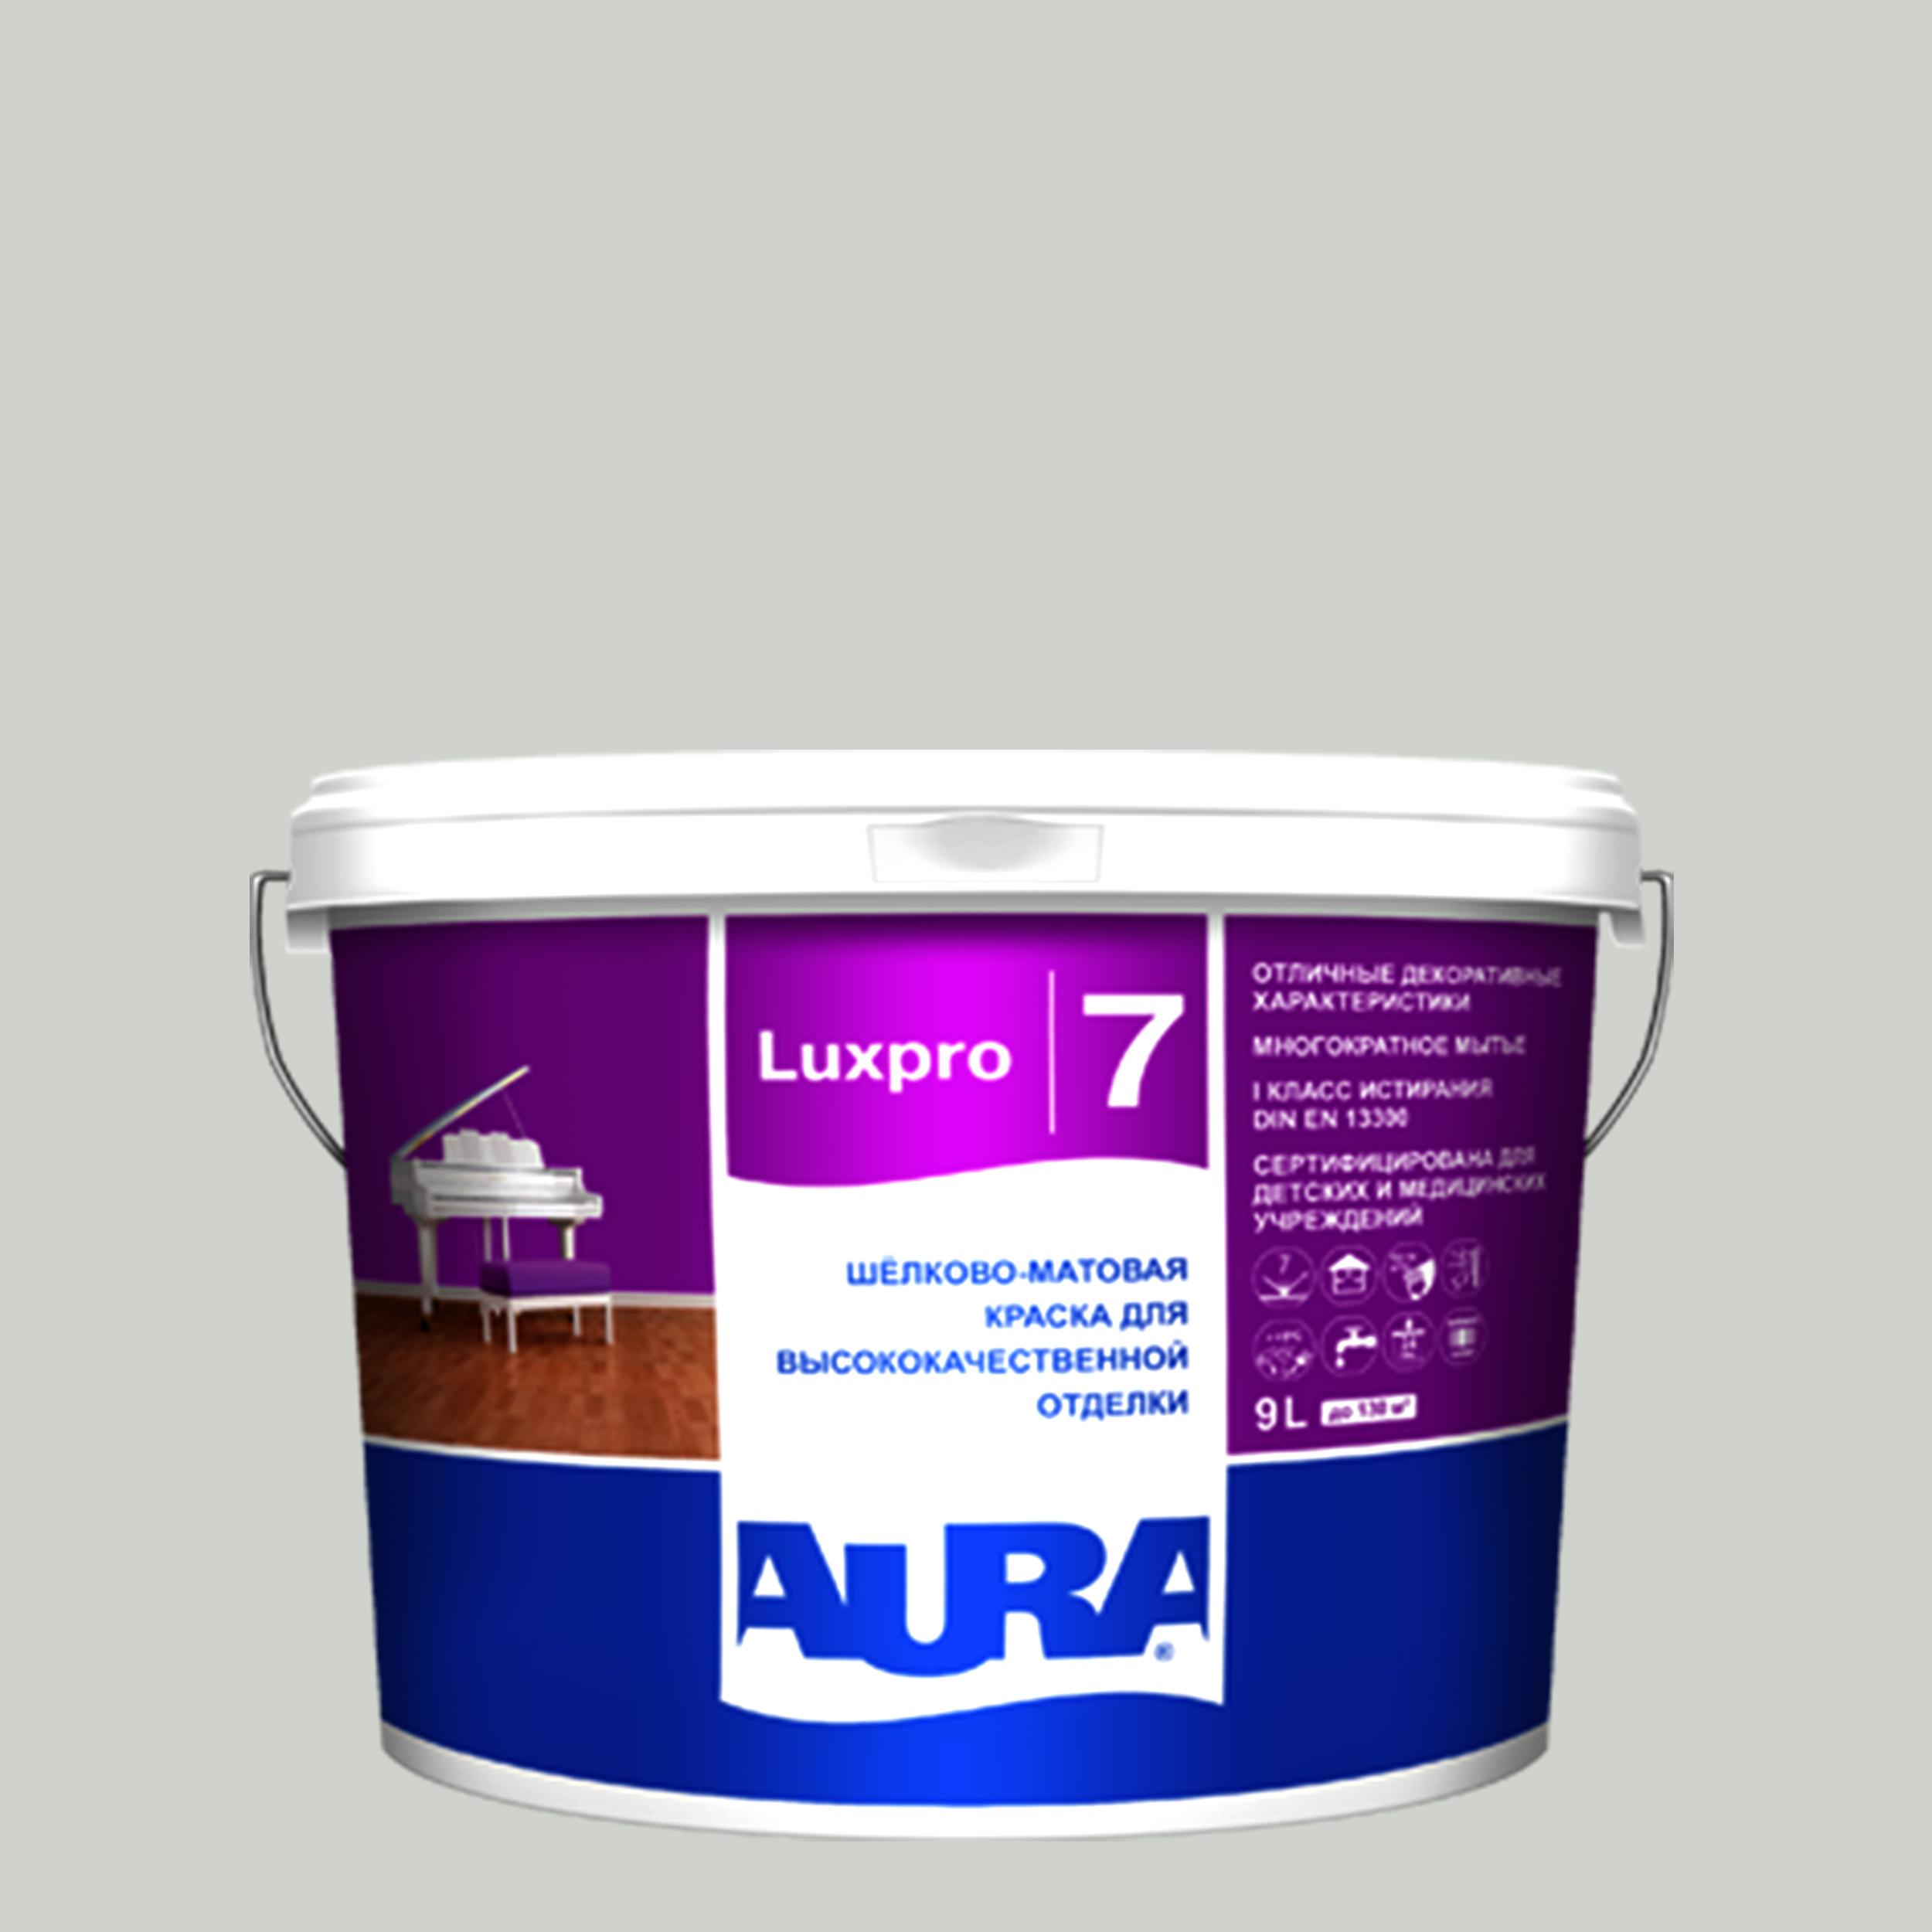 Фото 4 - Краска интерьерная, Aura LuxPRO 7, RAL 1020, 11 кг.